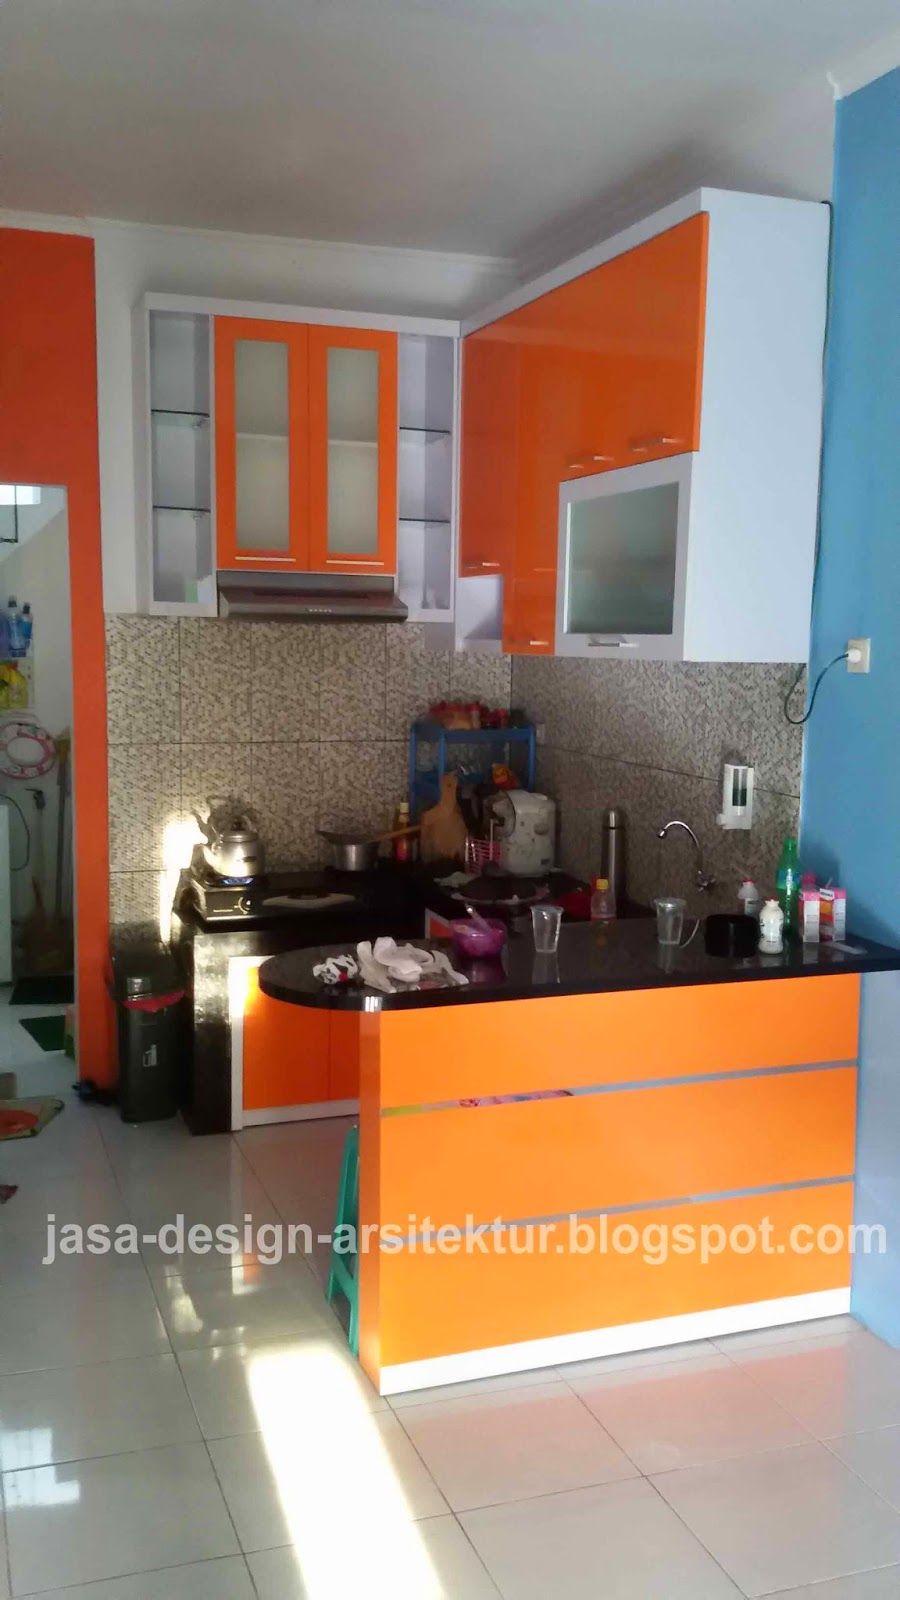 Desain dapur minimalis warna orange